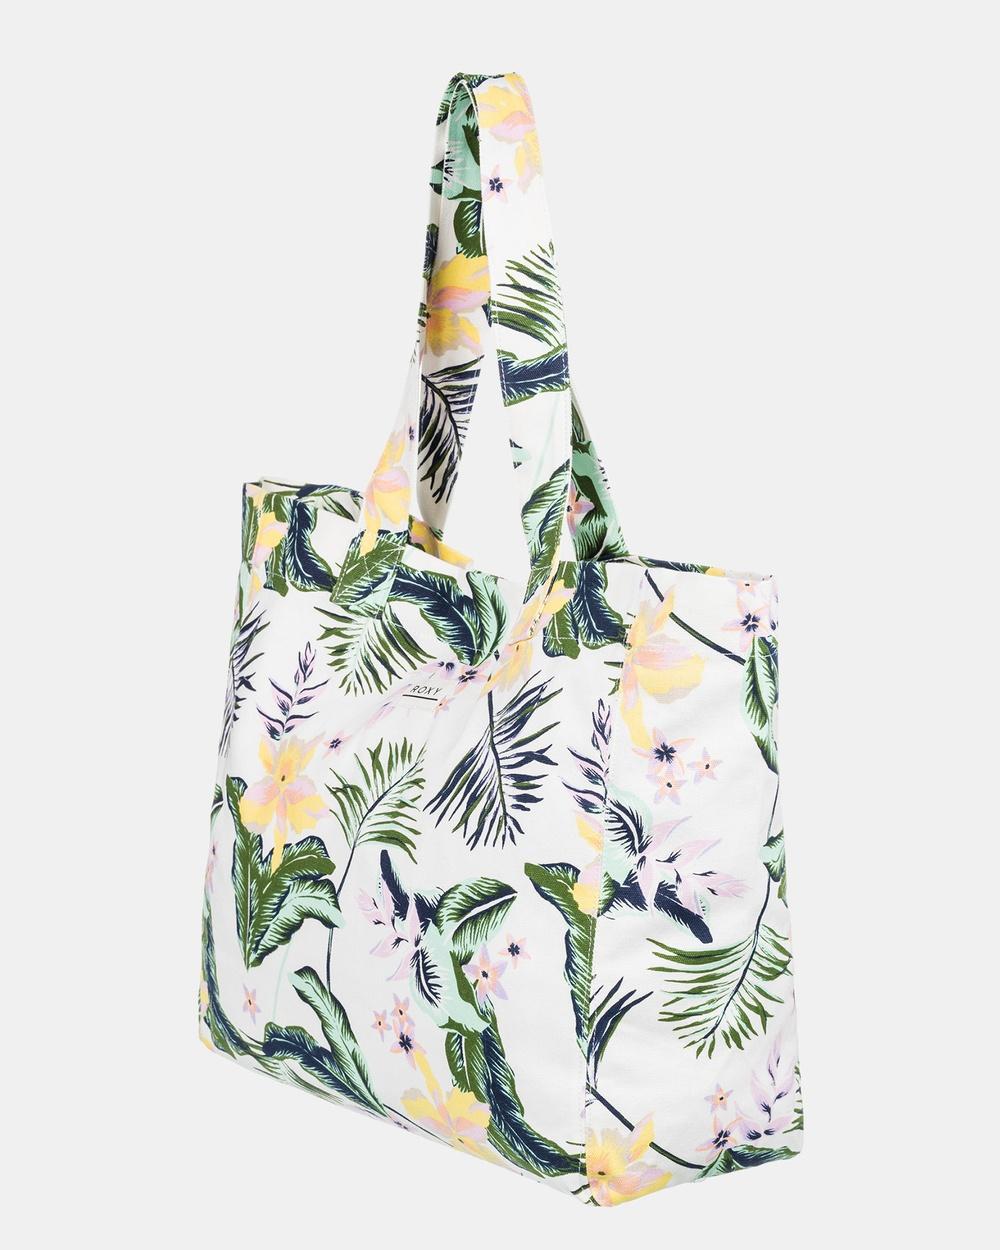 Roxy Womens Anti Bad Vibes Large Tote Bag Bags BRIGHT WHITE PRASLIN